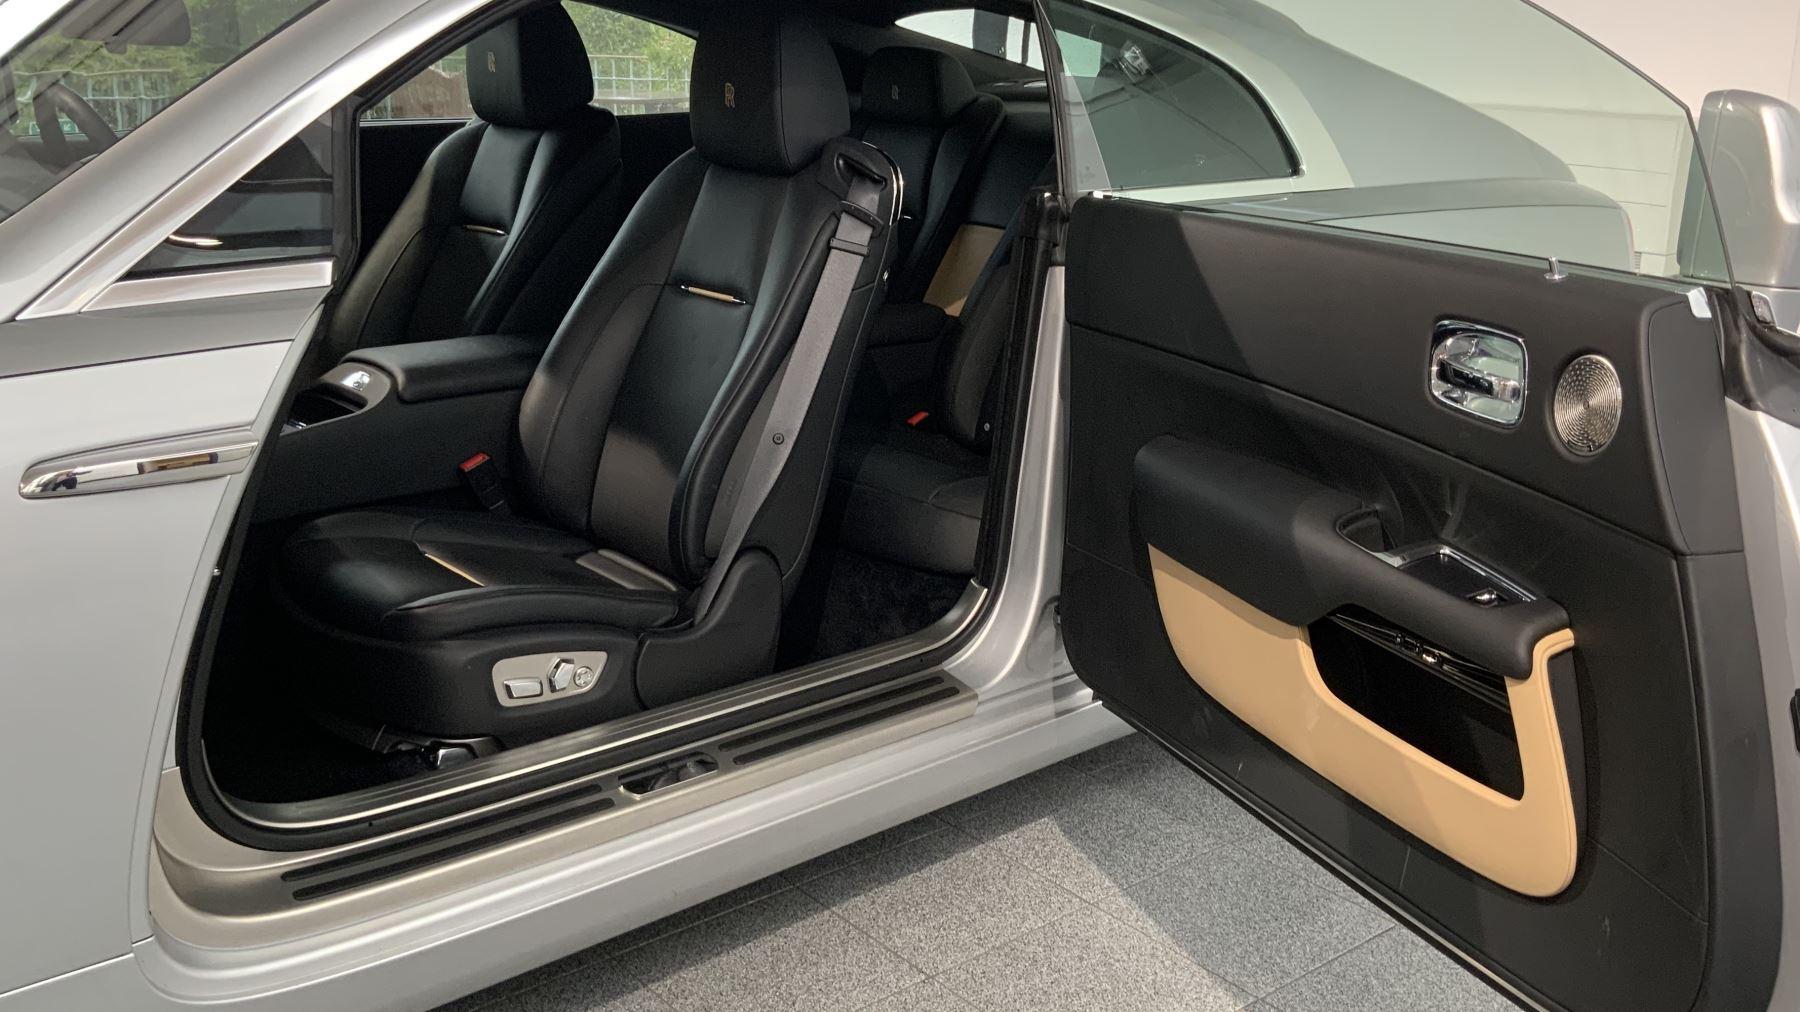 Rolls-Royce Wraith V12 image 22